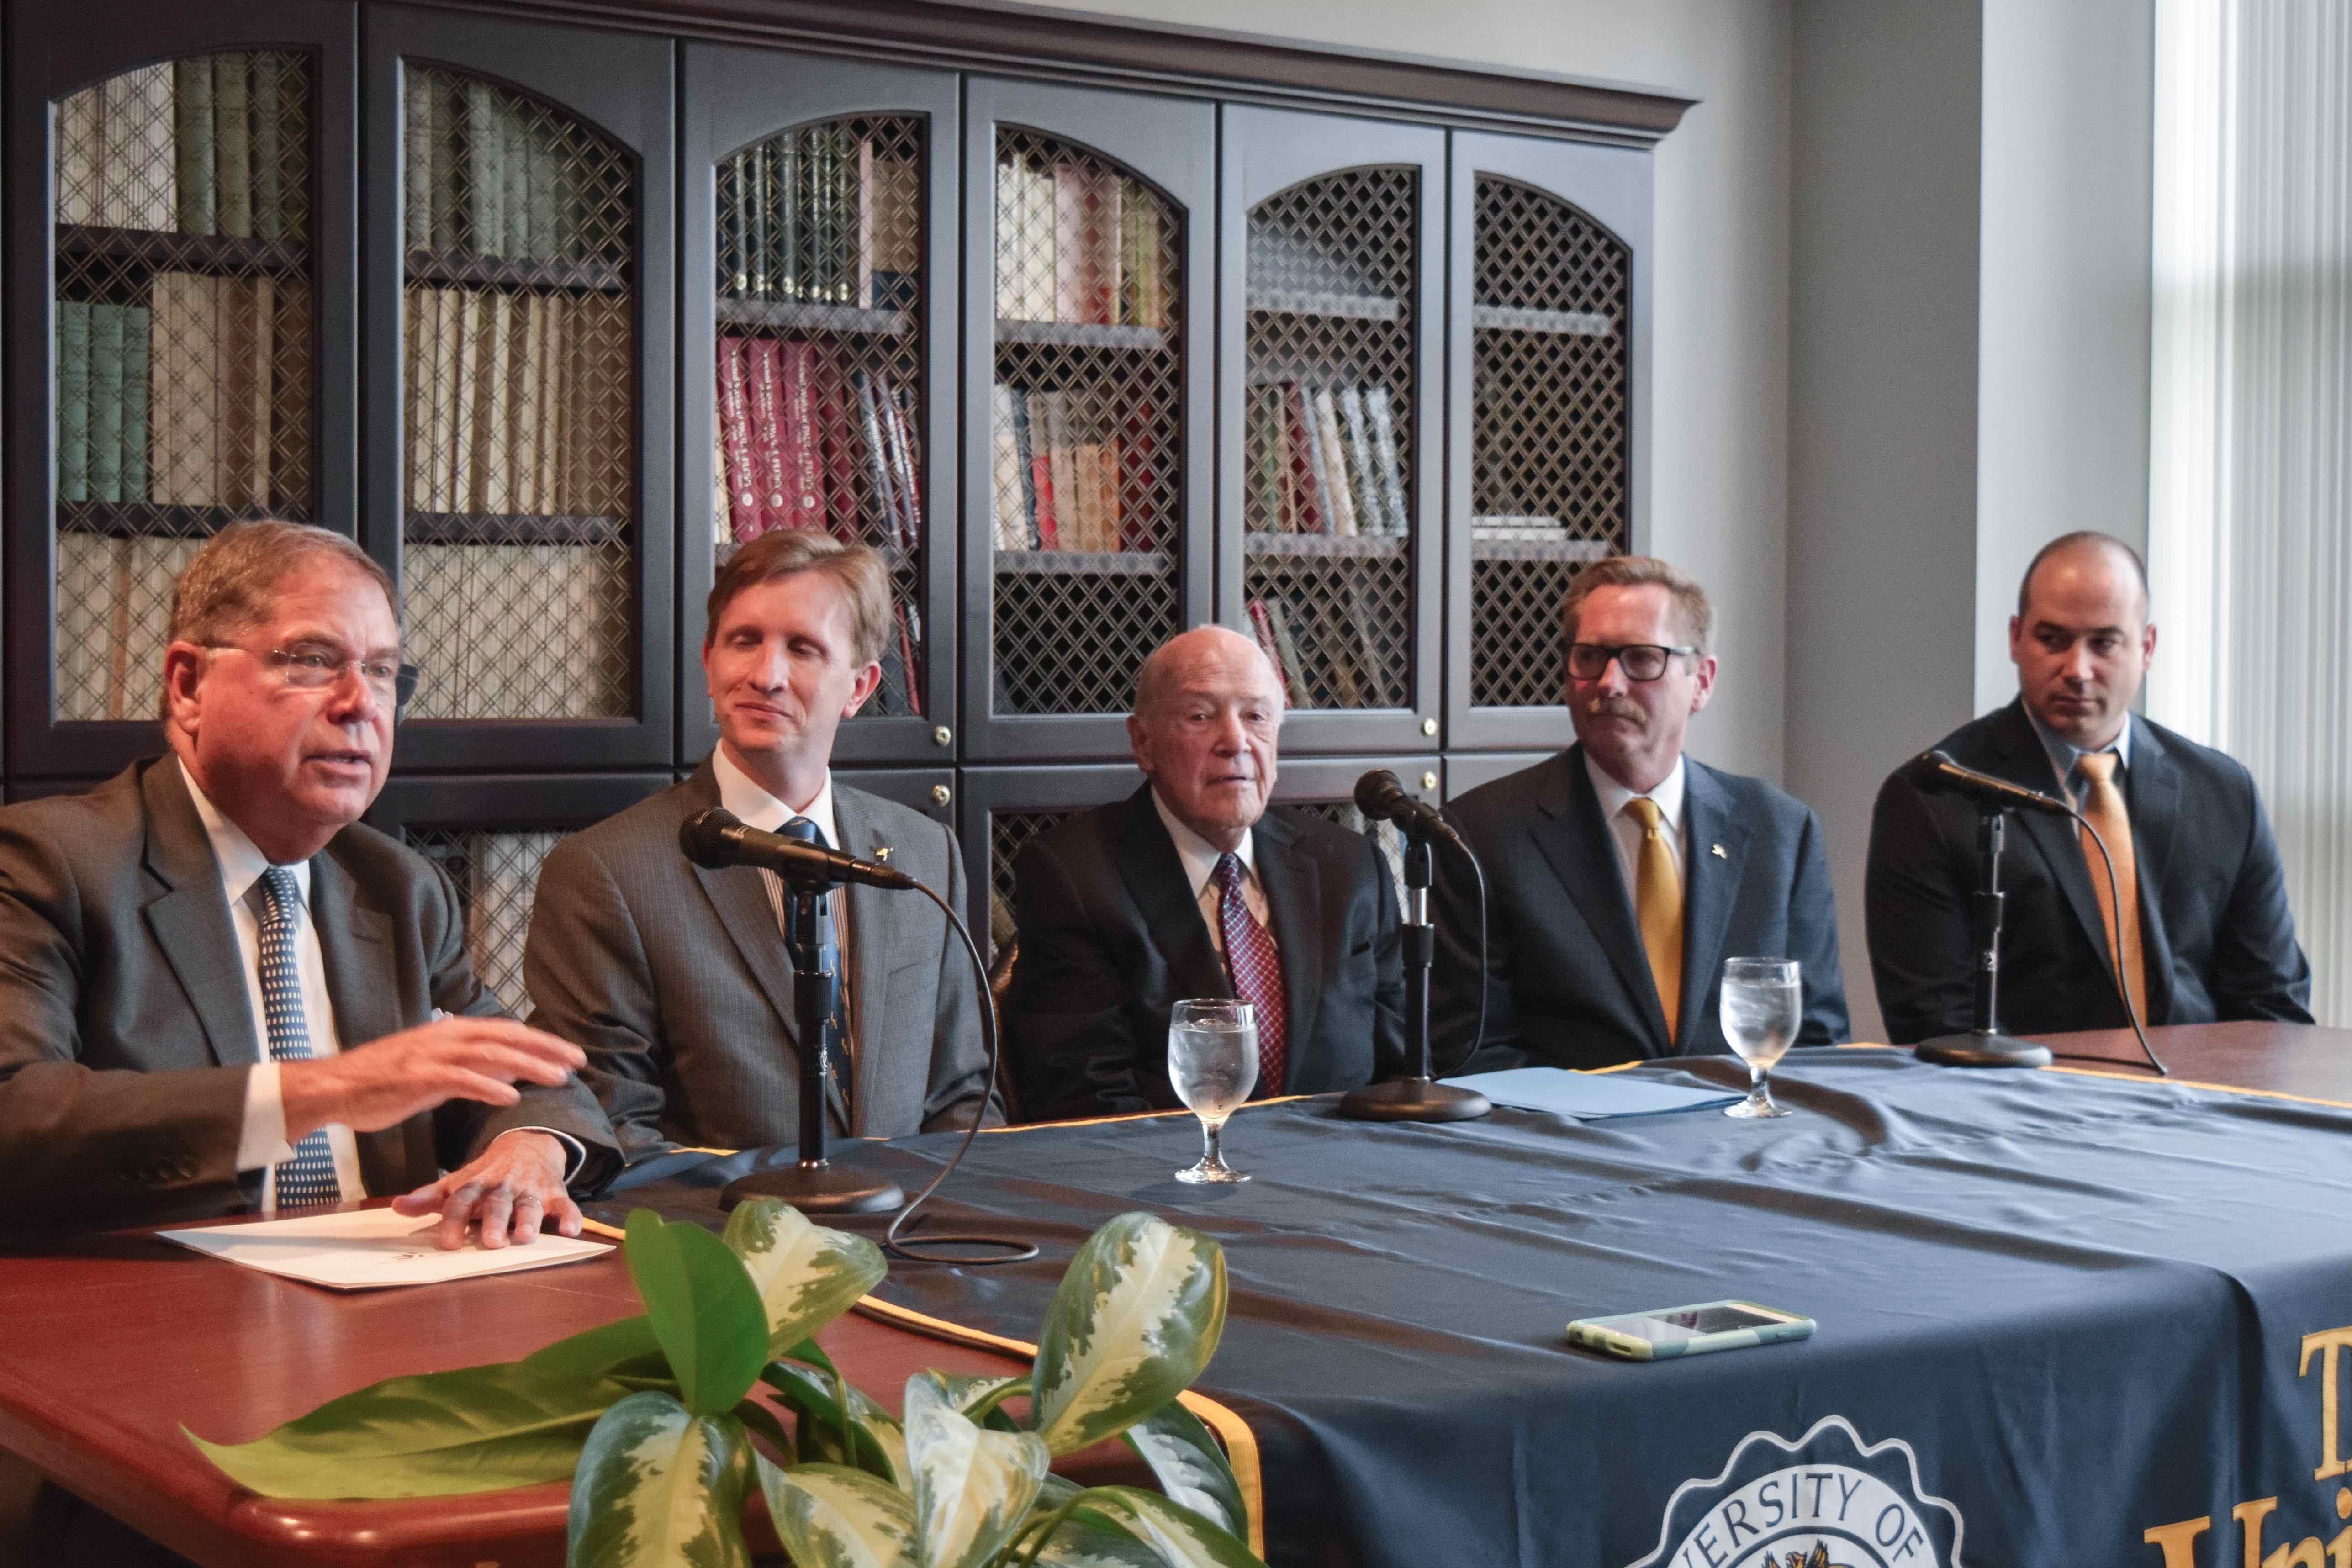 Left to right:  President of the Knight Foundation Alberto Ibarguen, UA President Matthew Wilson, Dr. Gerald Austen, Dean Eric Amis, Professor Matthew Becker.